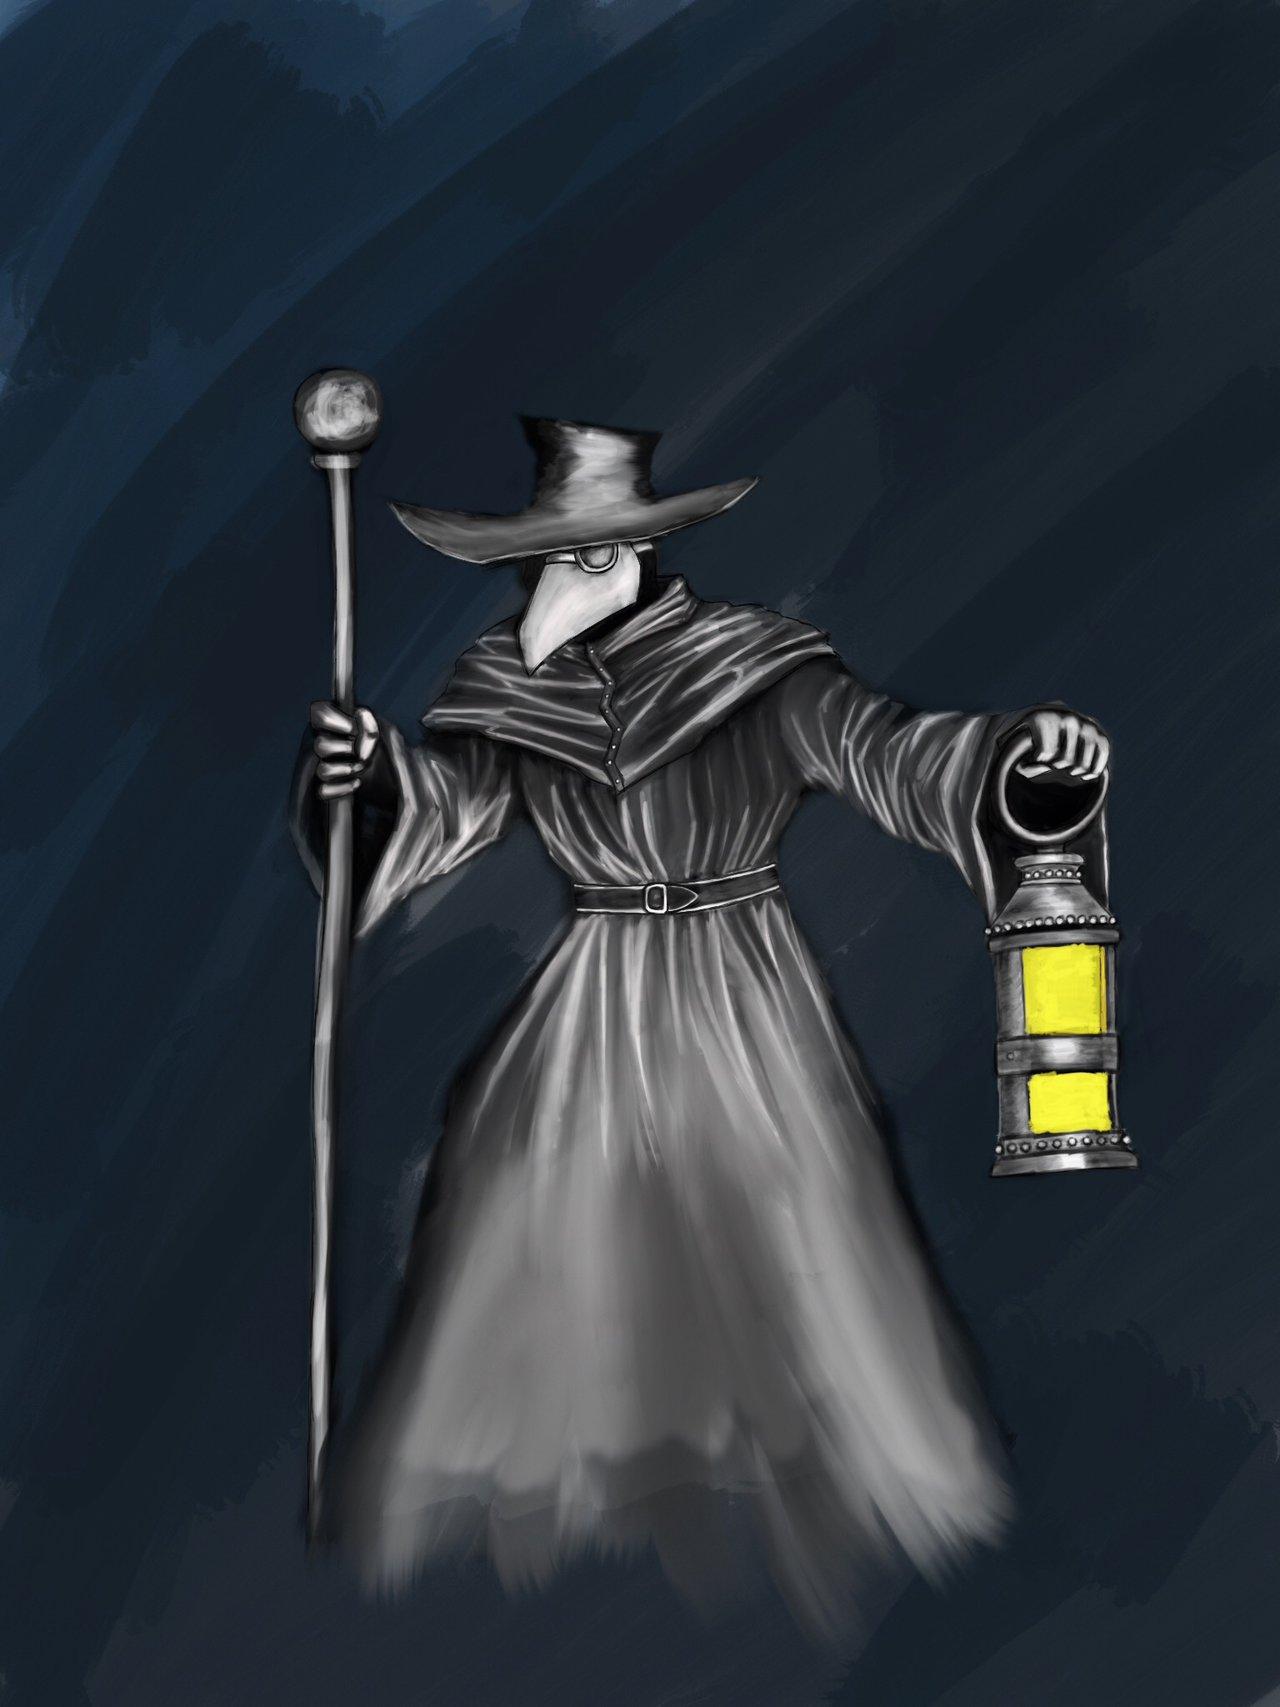 Plague doctor by Felarn 1280x1707